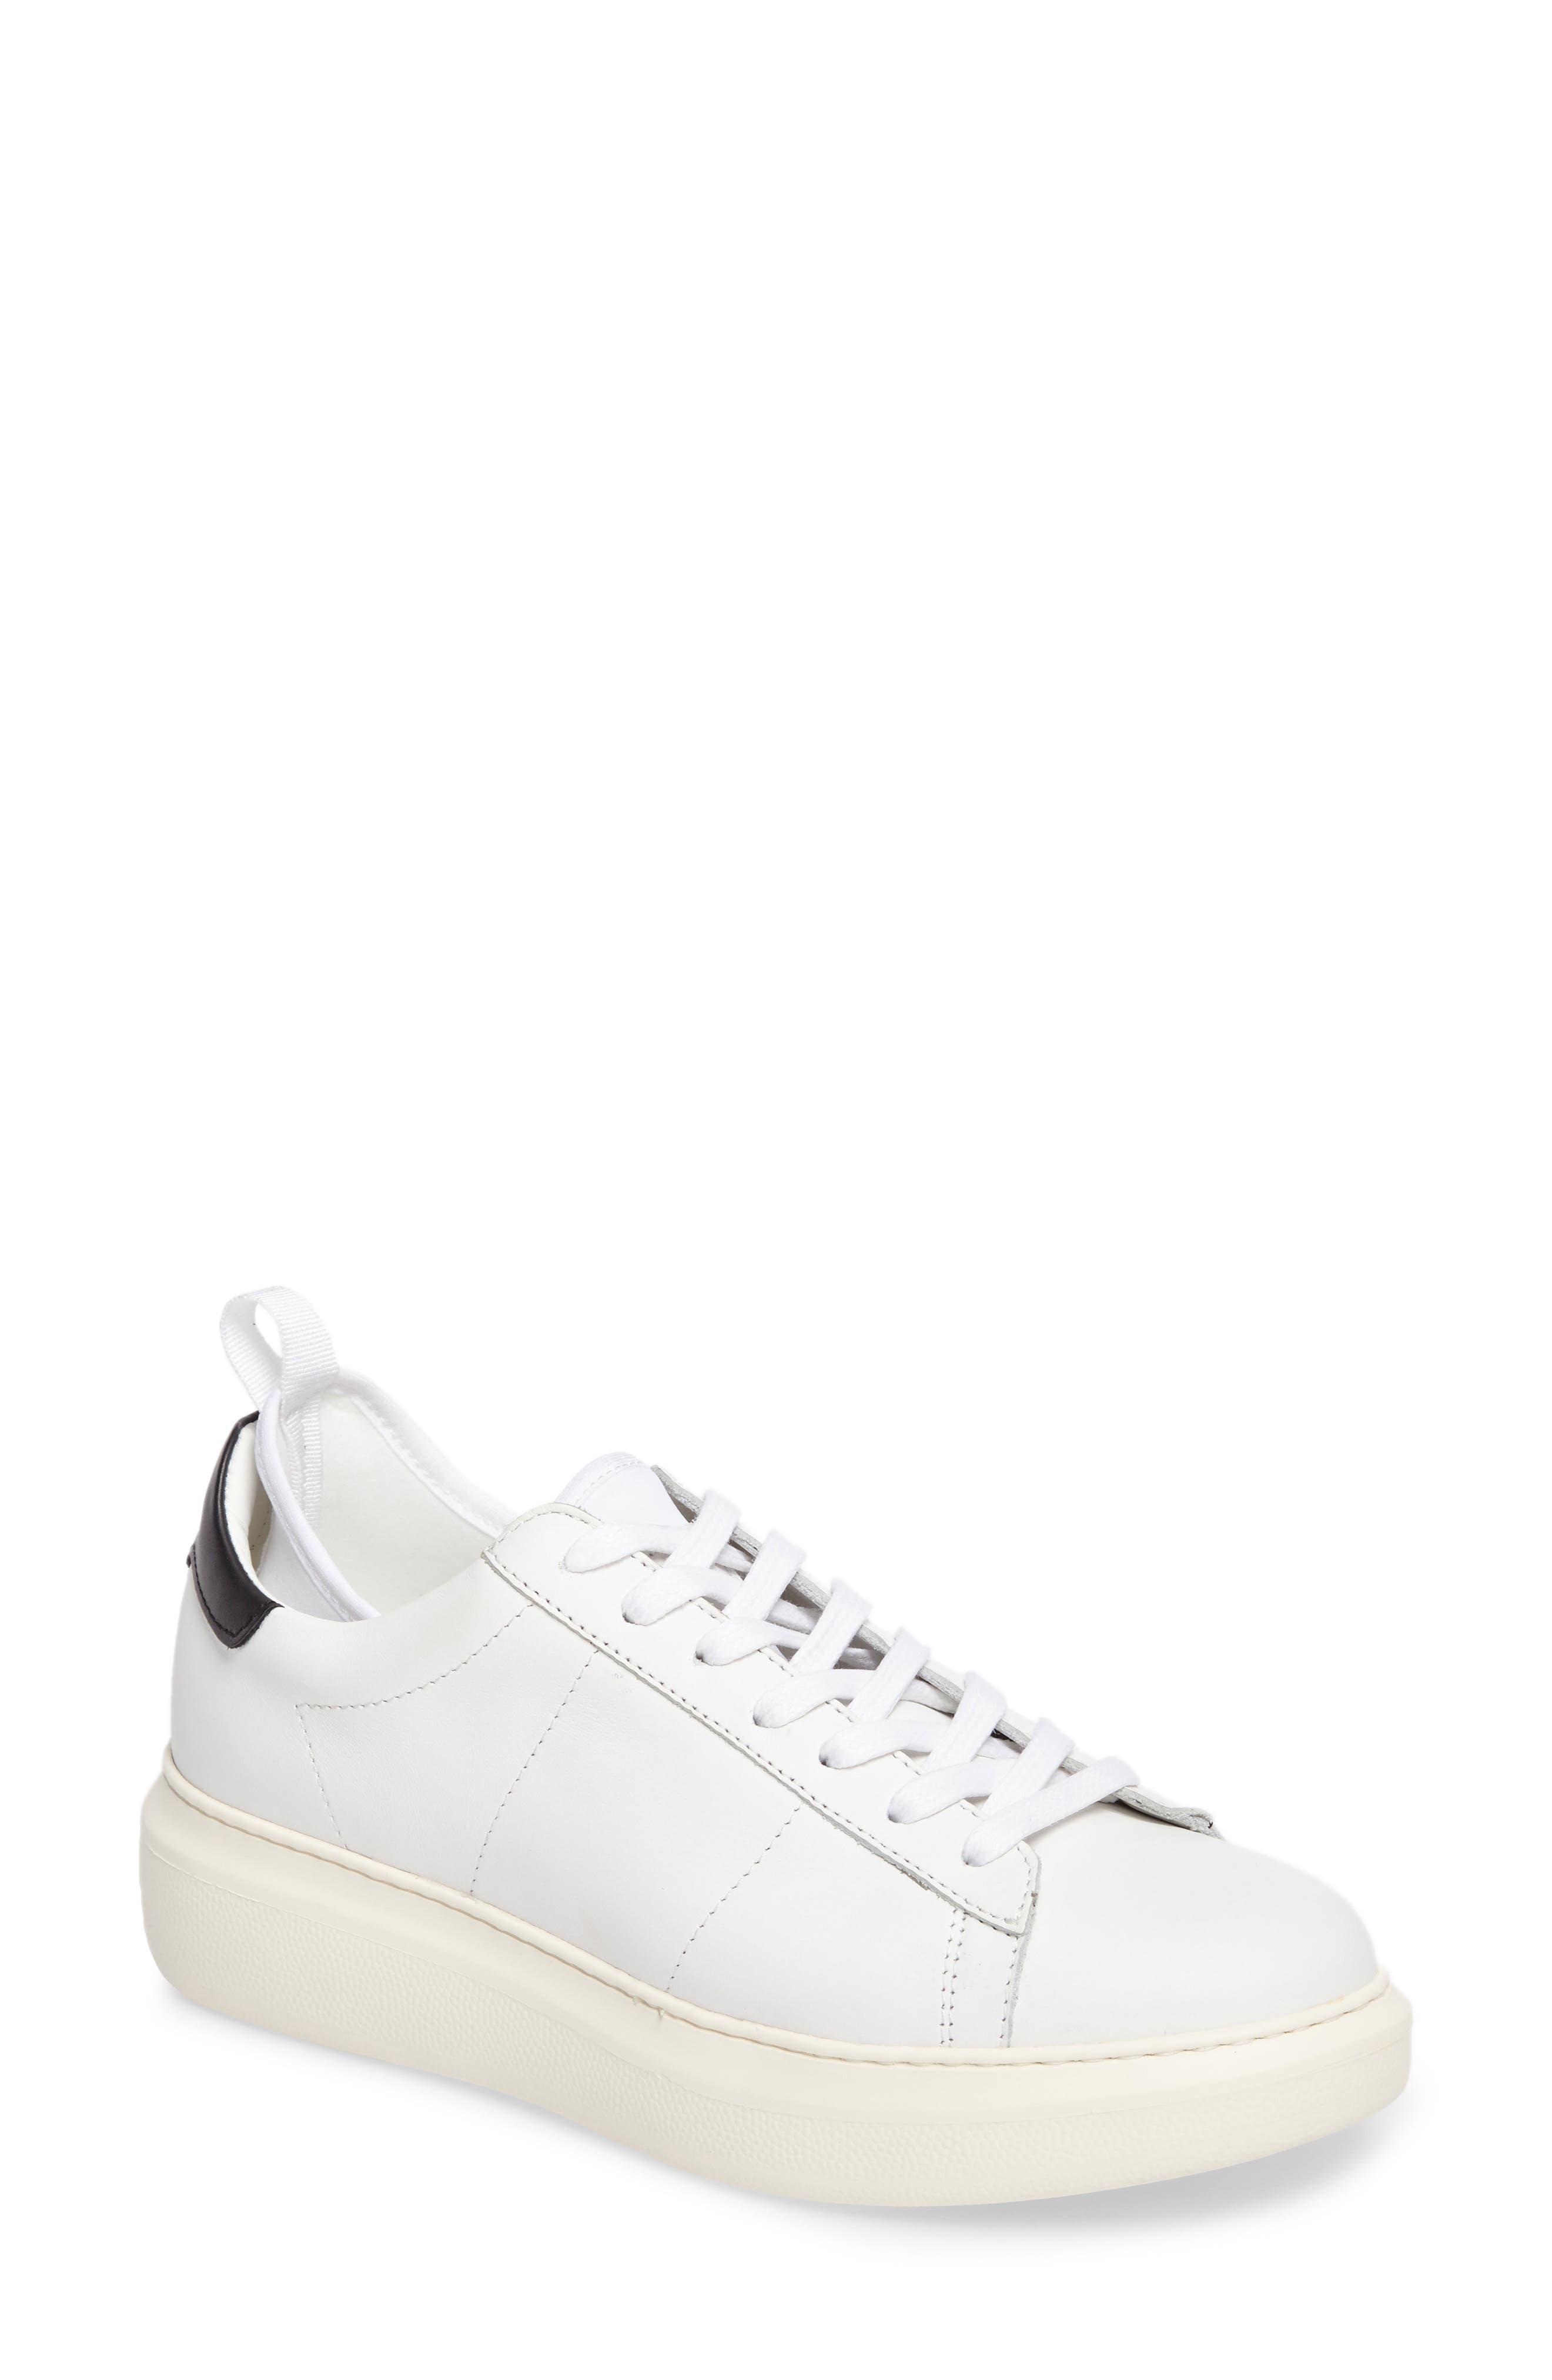 Main Image - Greats Alta Low Top Sneaker (Women)